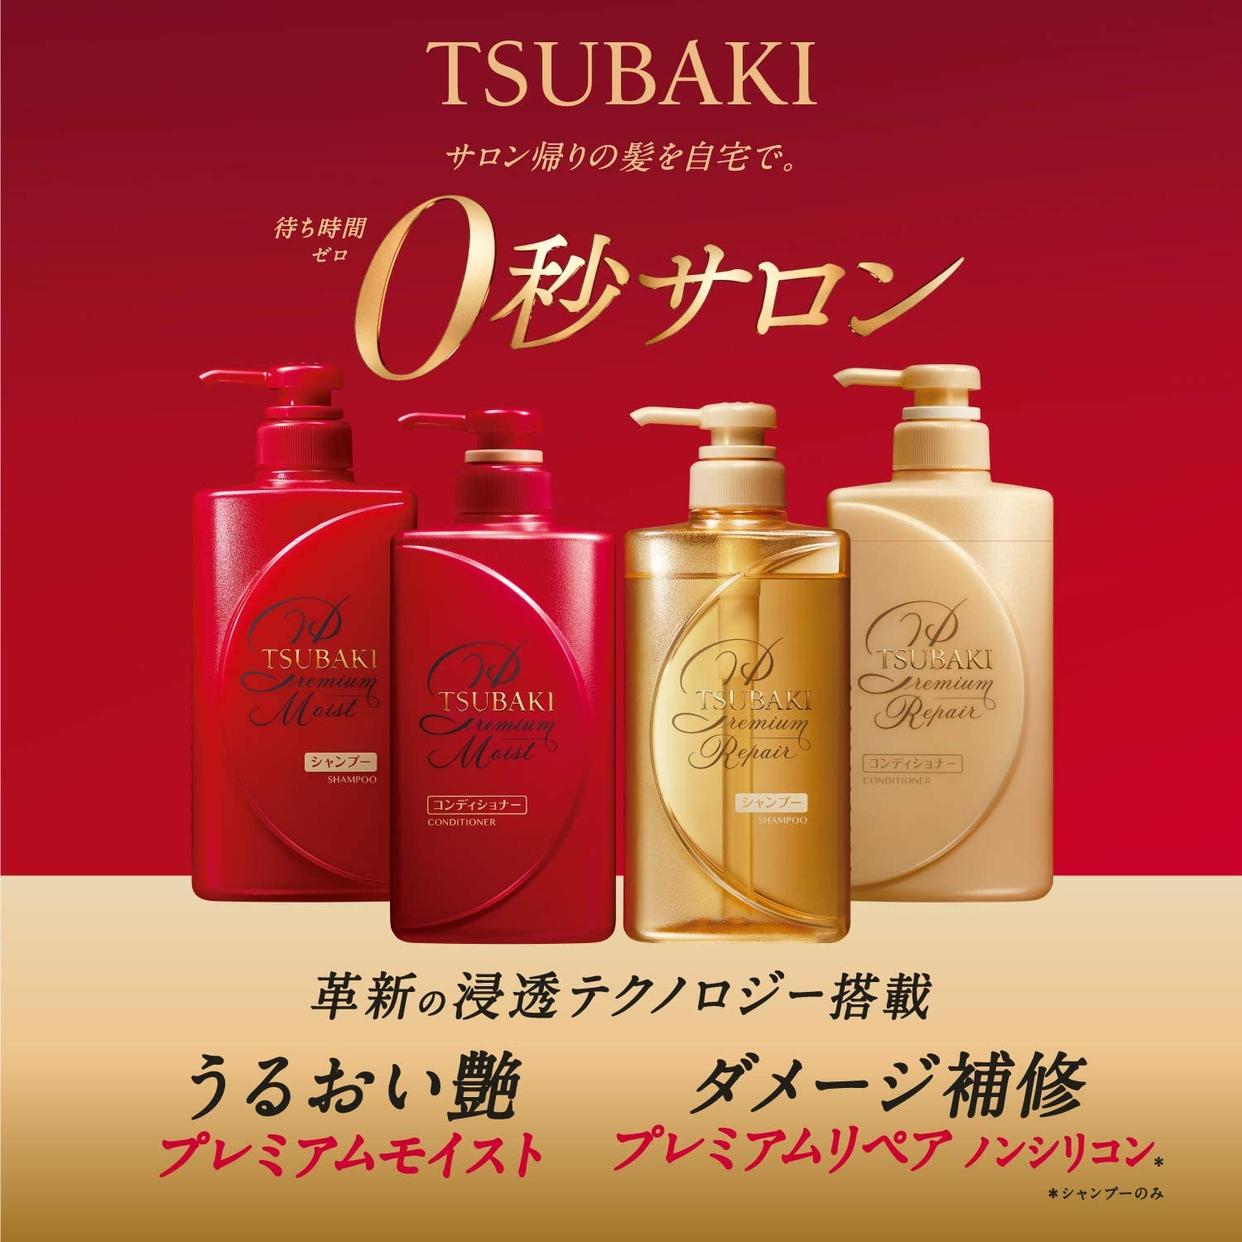 TSUBAKI(ツバキ)プレミアムモイスト ヘアコンディショナーの商品画像3